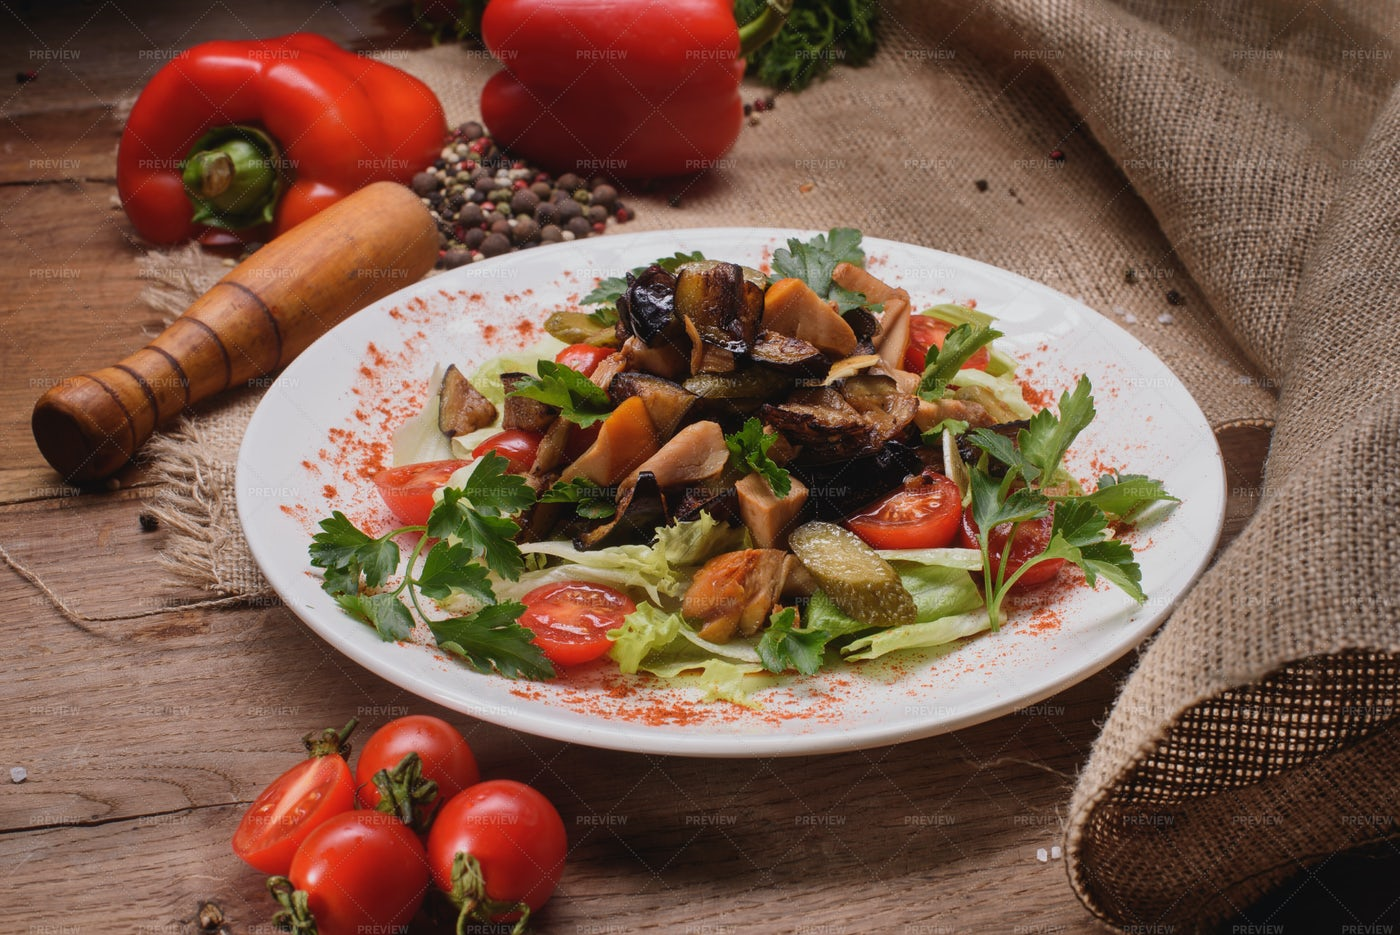 Warm Eggplant Salad On Rustic Table: Stock Photos